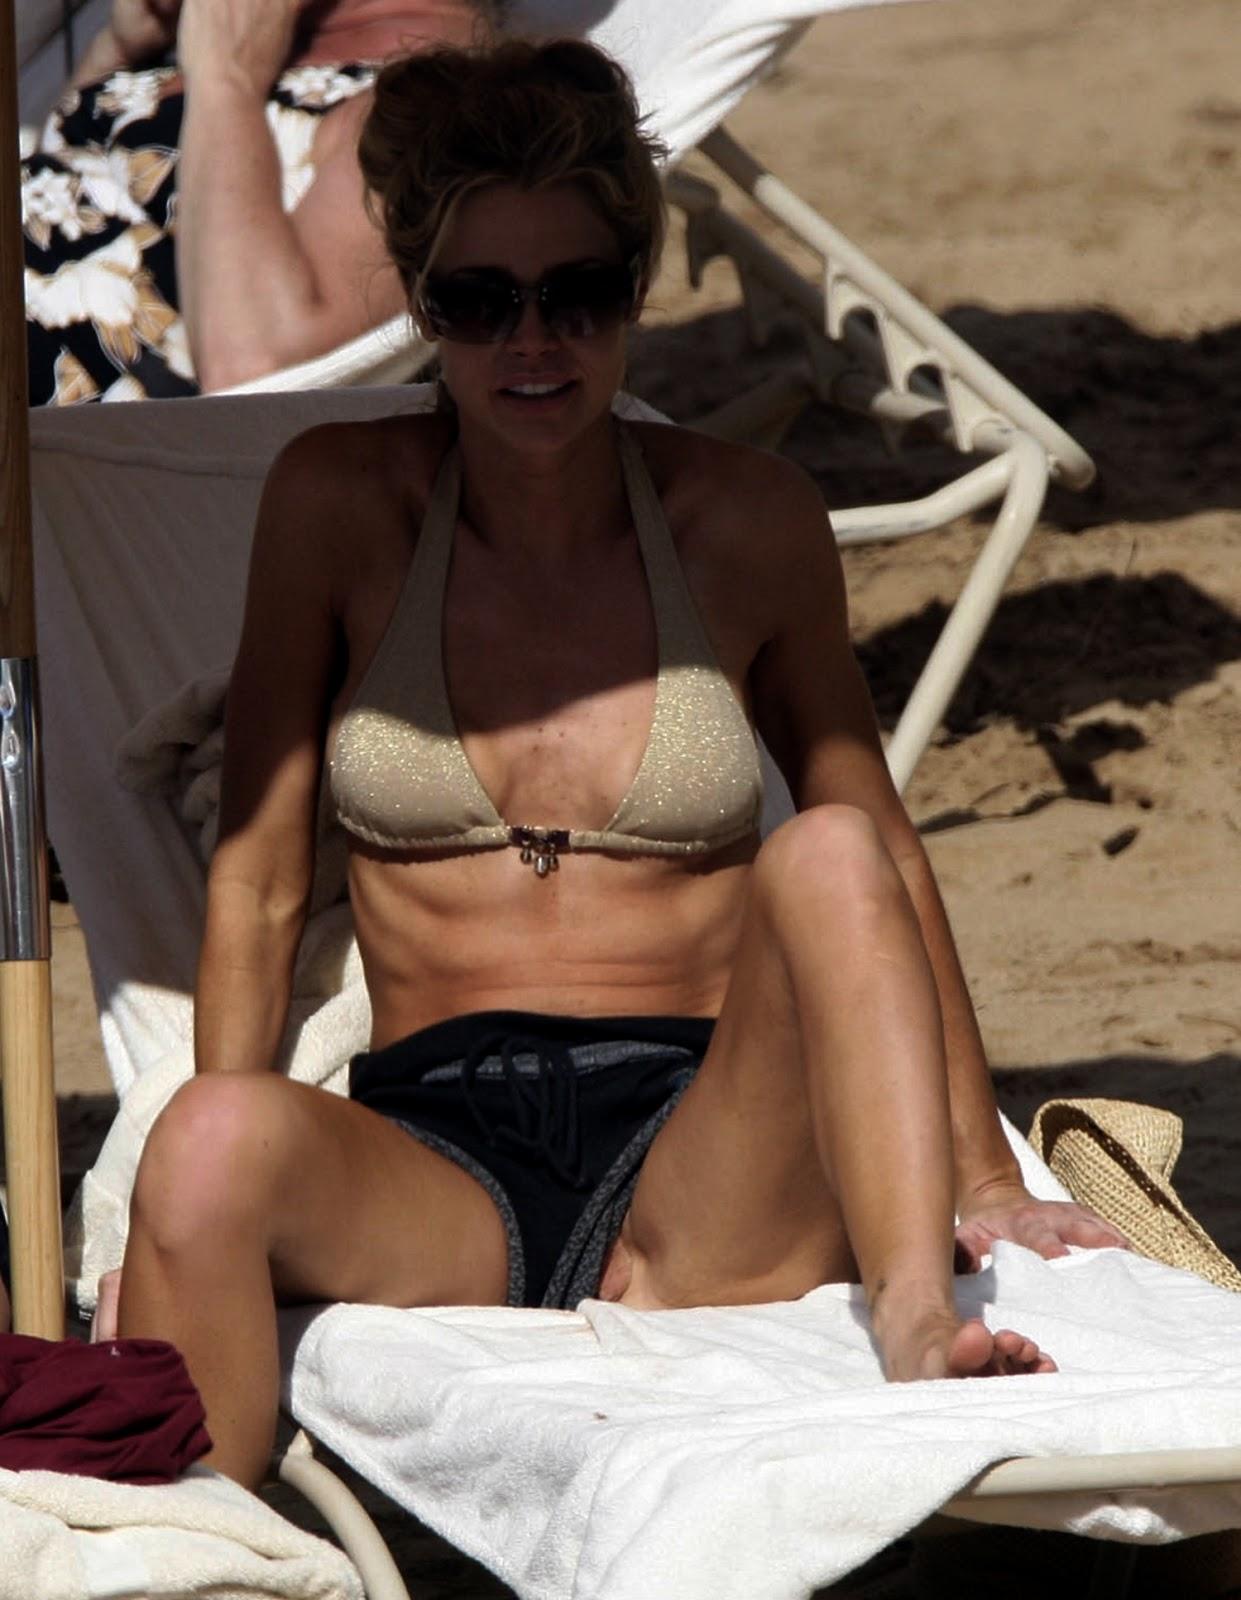 Celebrities denise richards amp neve campbell threesome sex 7